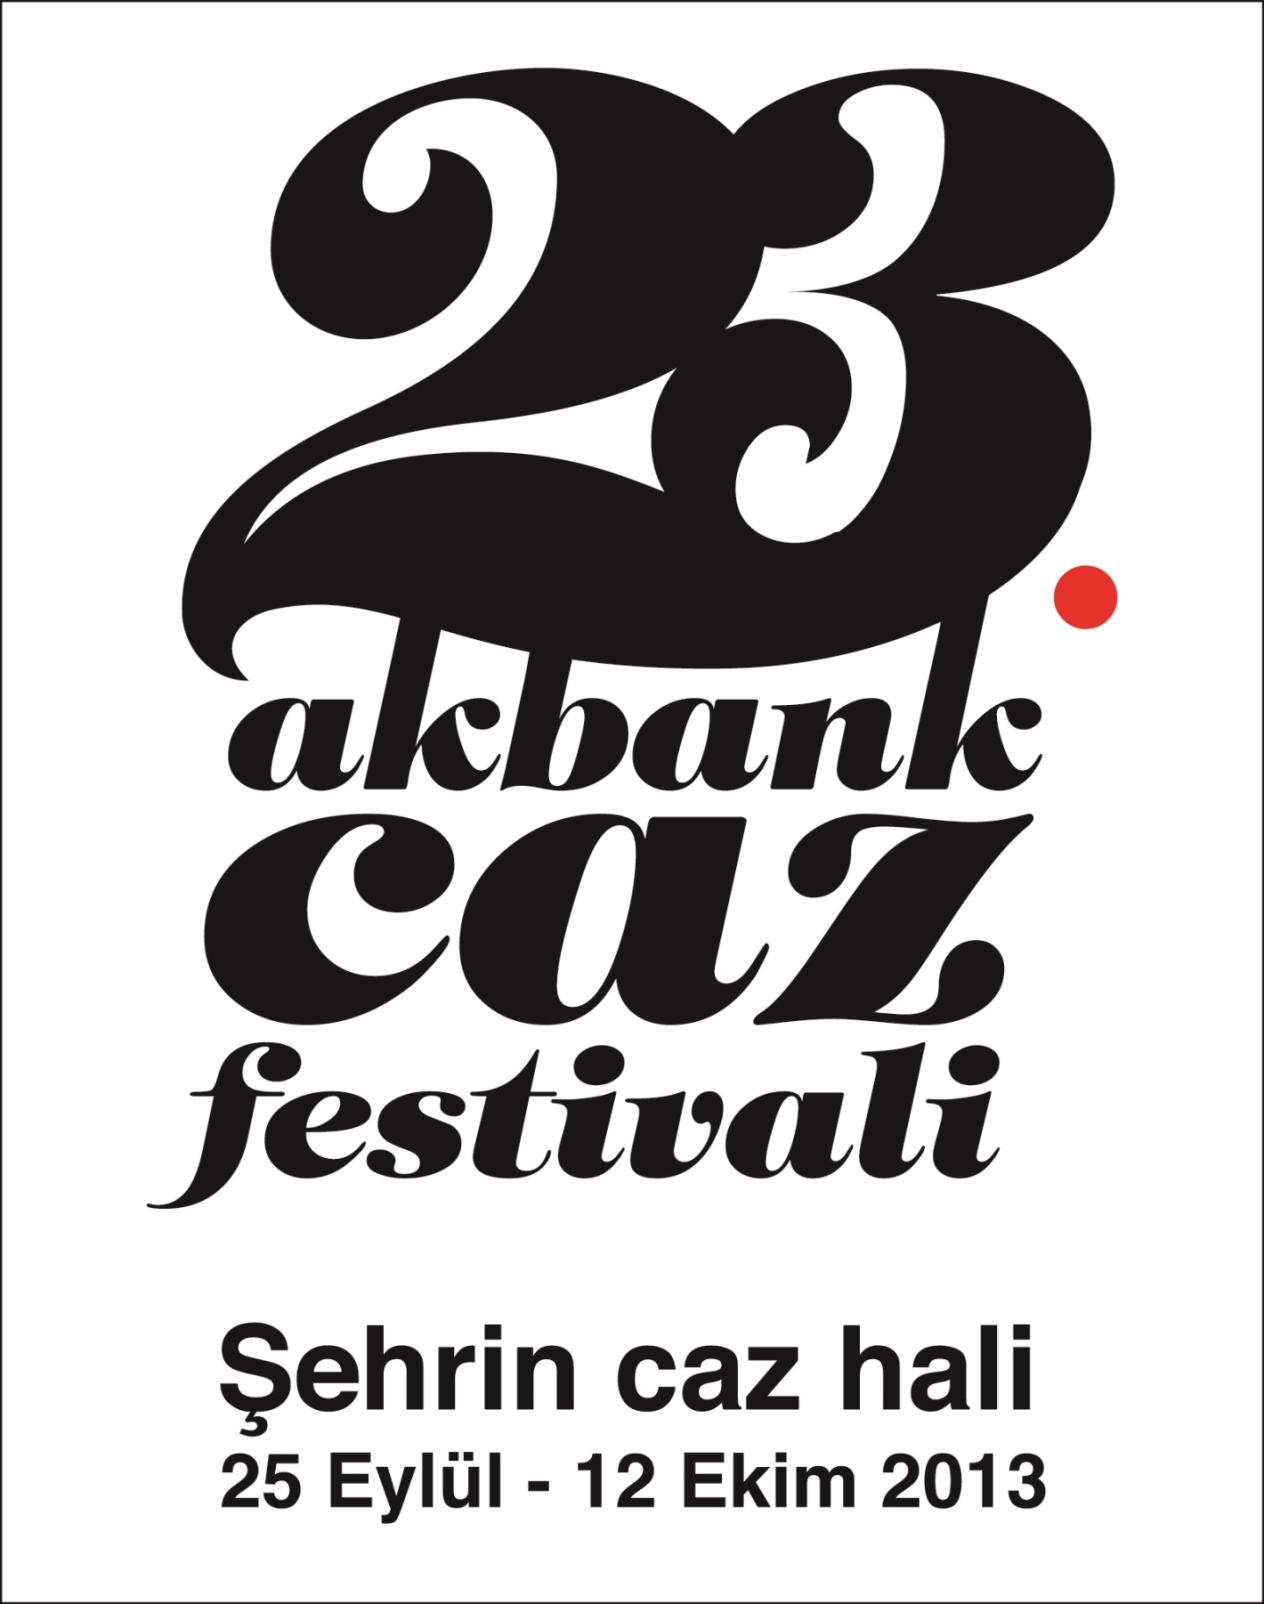 23.-Akbank-Caz-Festivali-logo